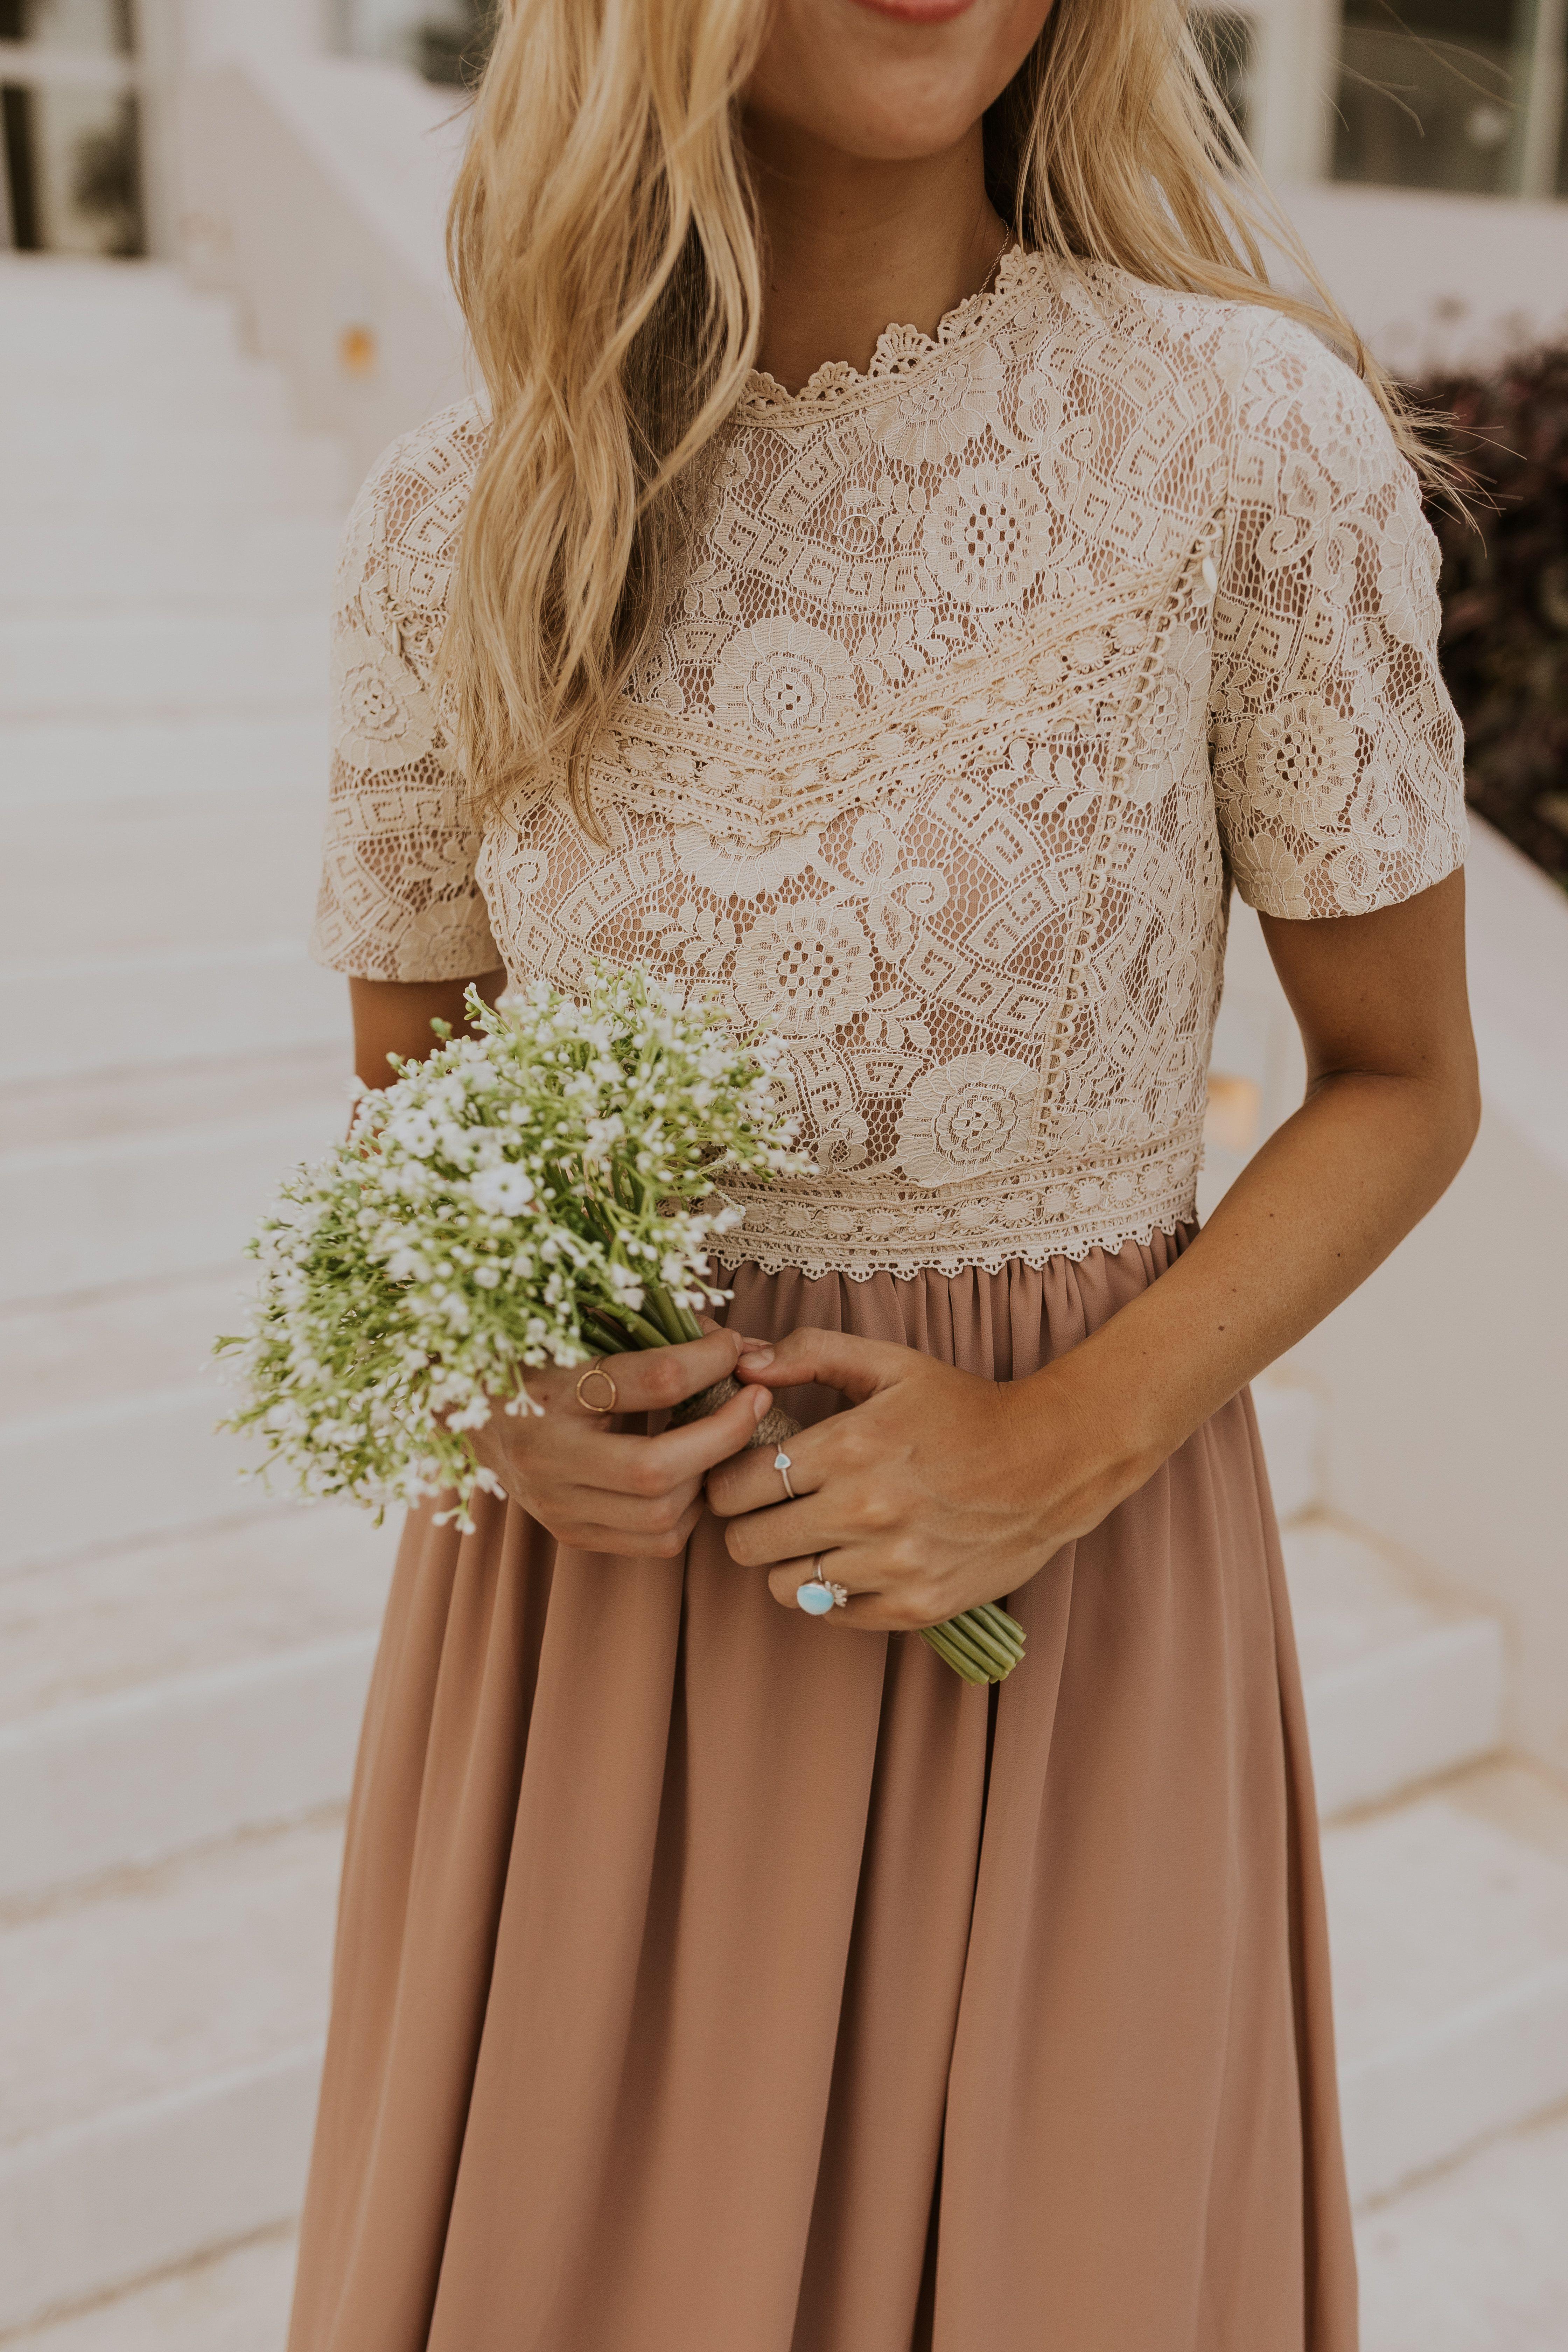 #kleider brautjungfer Bridesmaid Dress Guide for Every Wedding Style